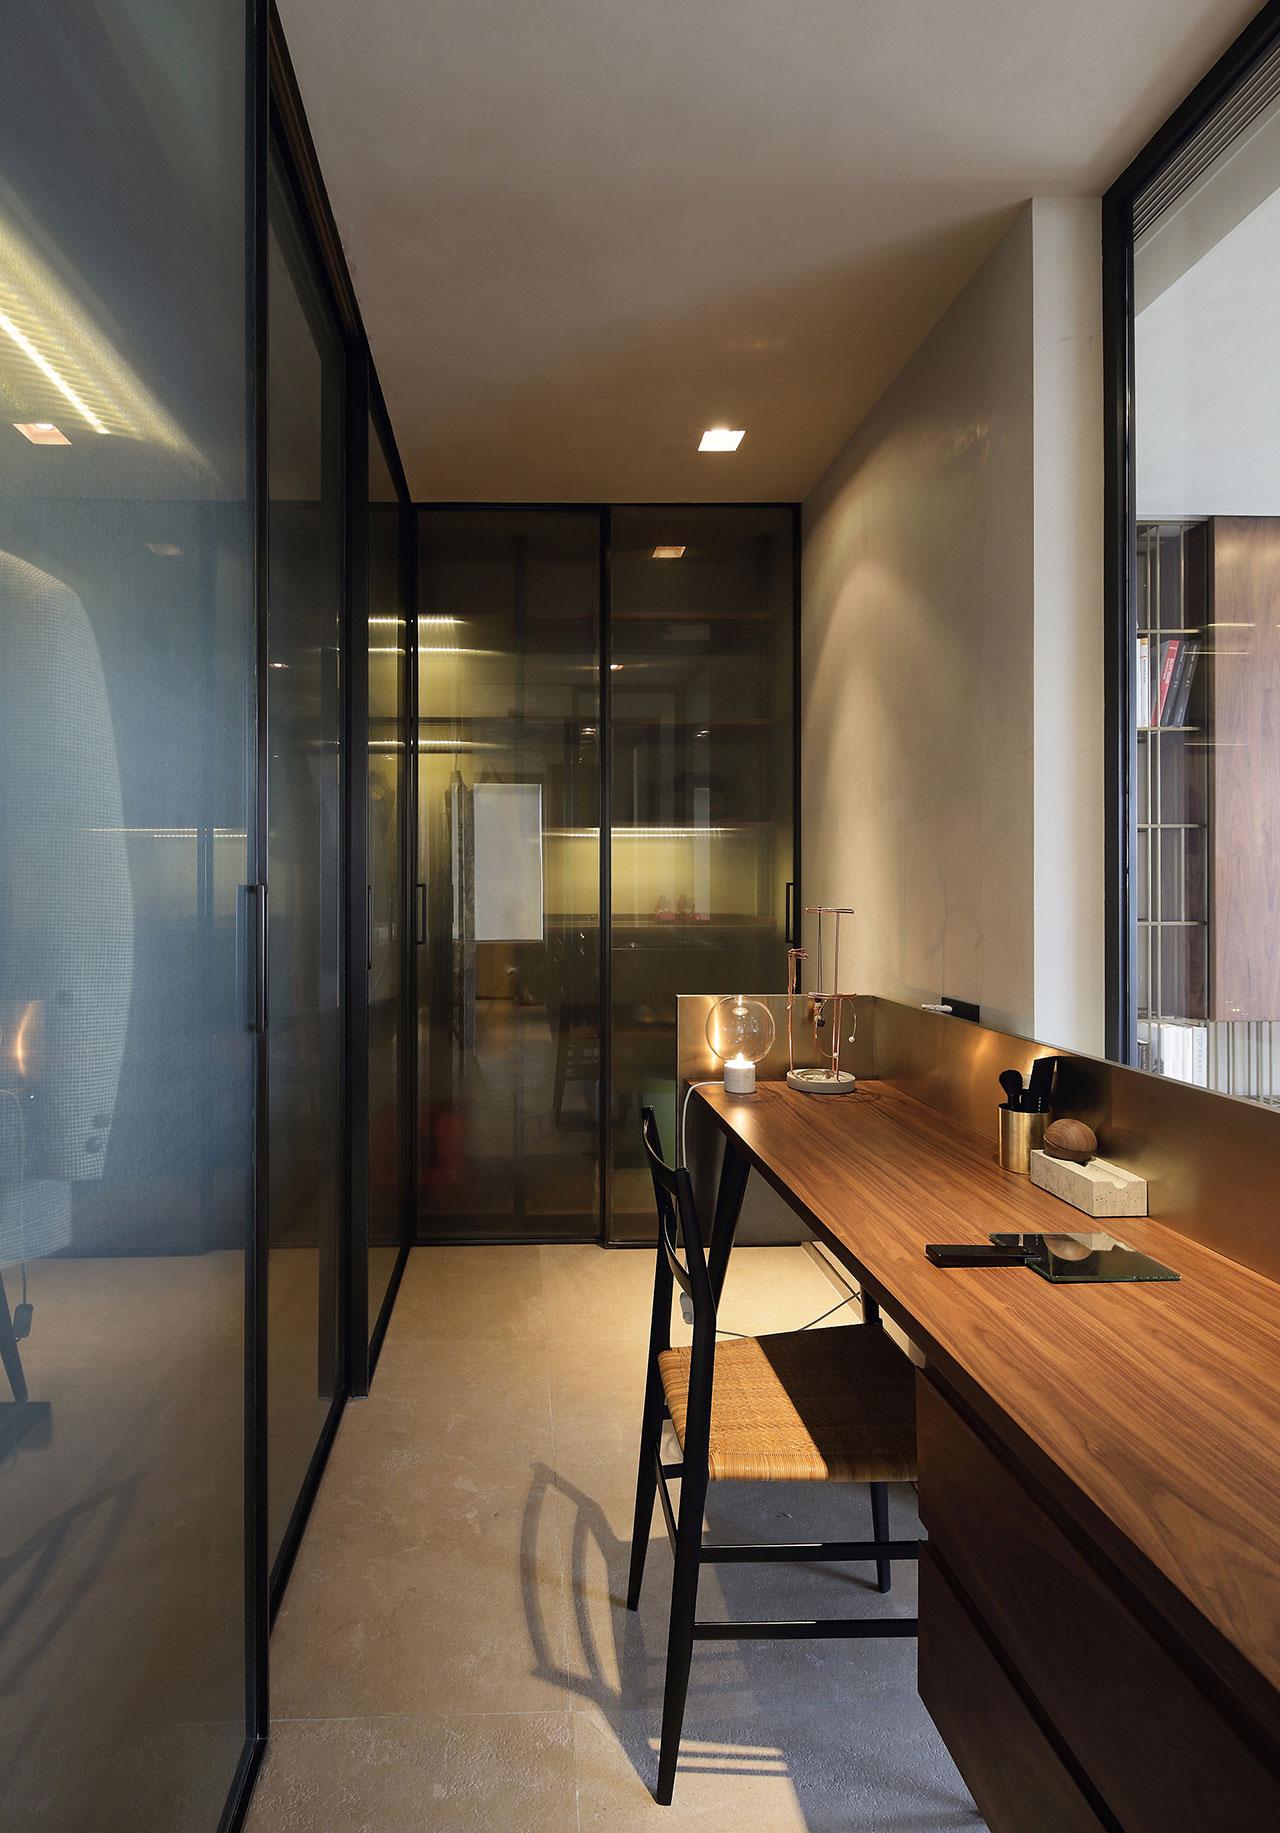 s9_show_flat_origins_dongguan_china_minas_kosmidis_architecture_in_concept_yatzer